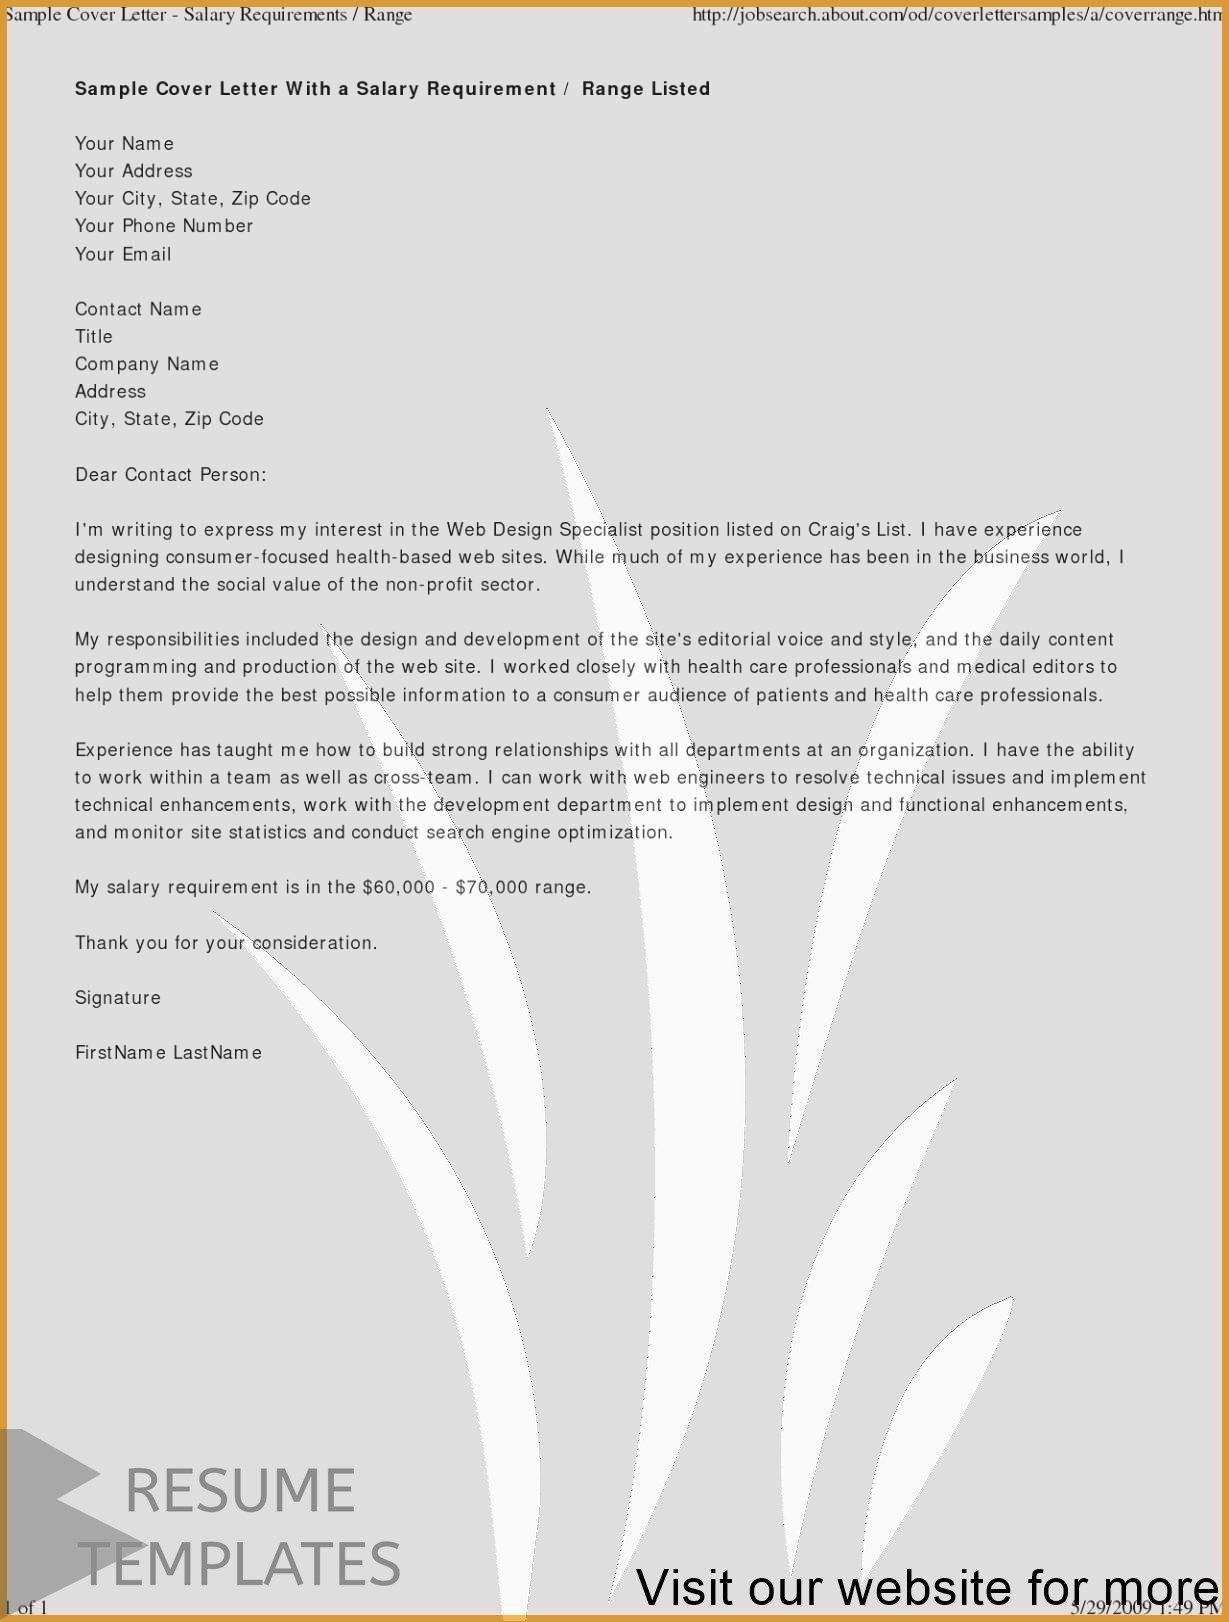 resume template australia Best in 2020 Resume template